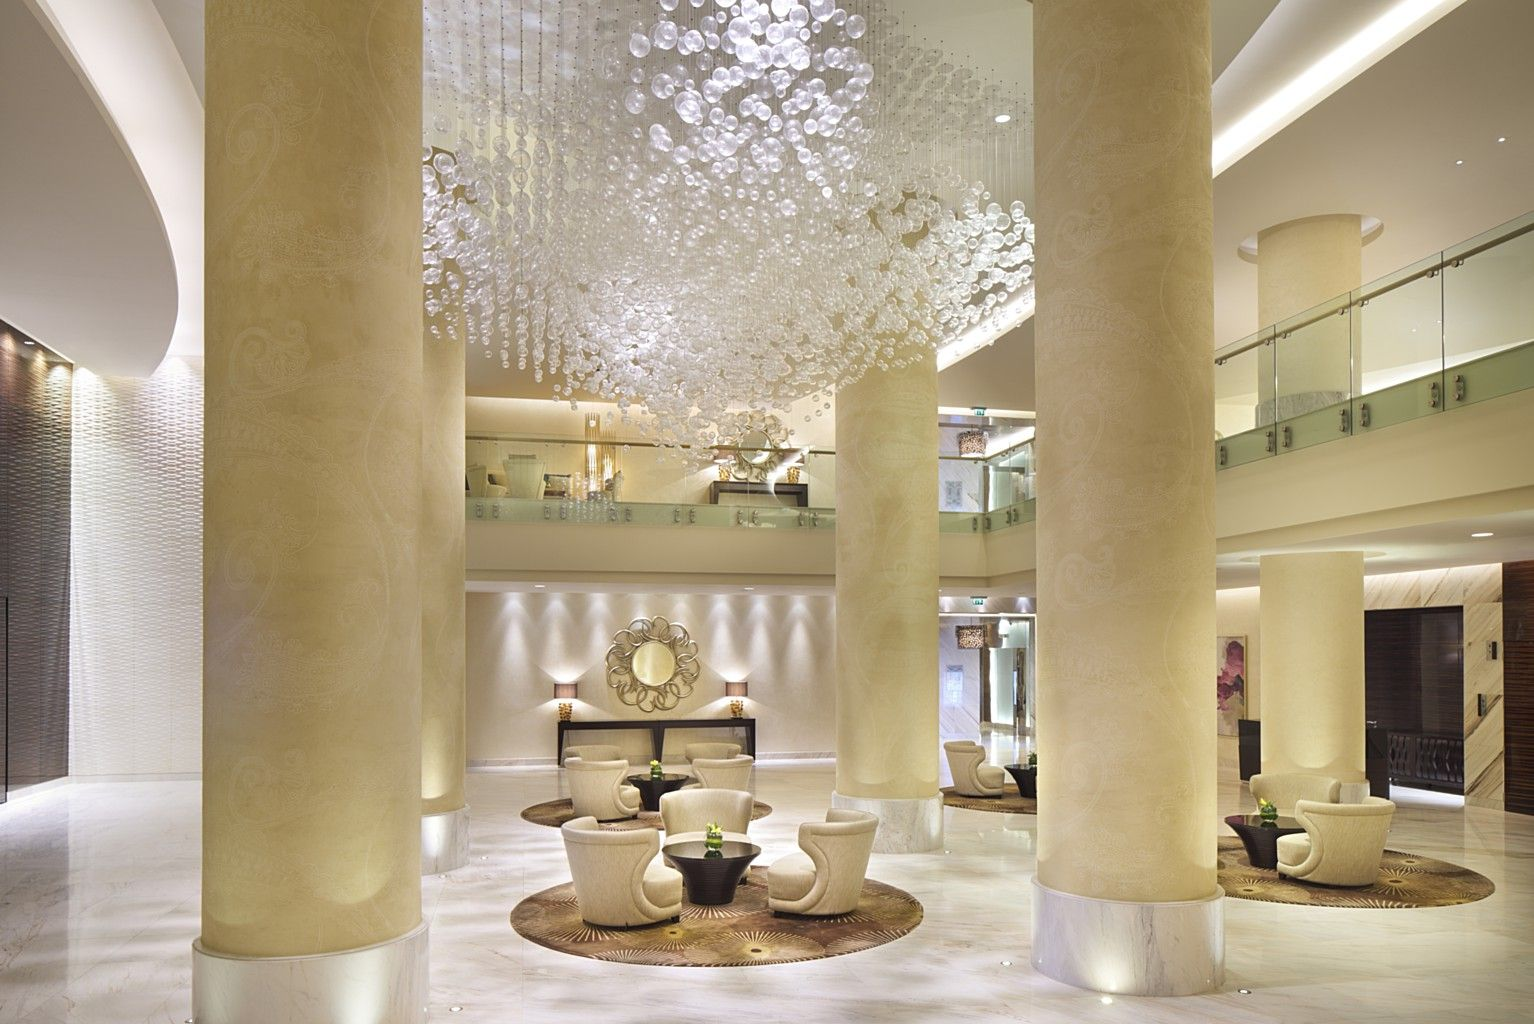 Hospitality Jw Marriott Hotel Absheron Baku Marriott Hotels Hotel Entrance Hotel